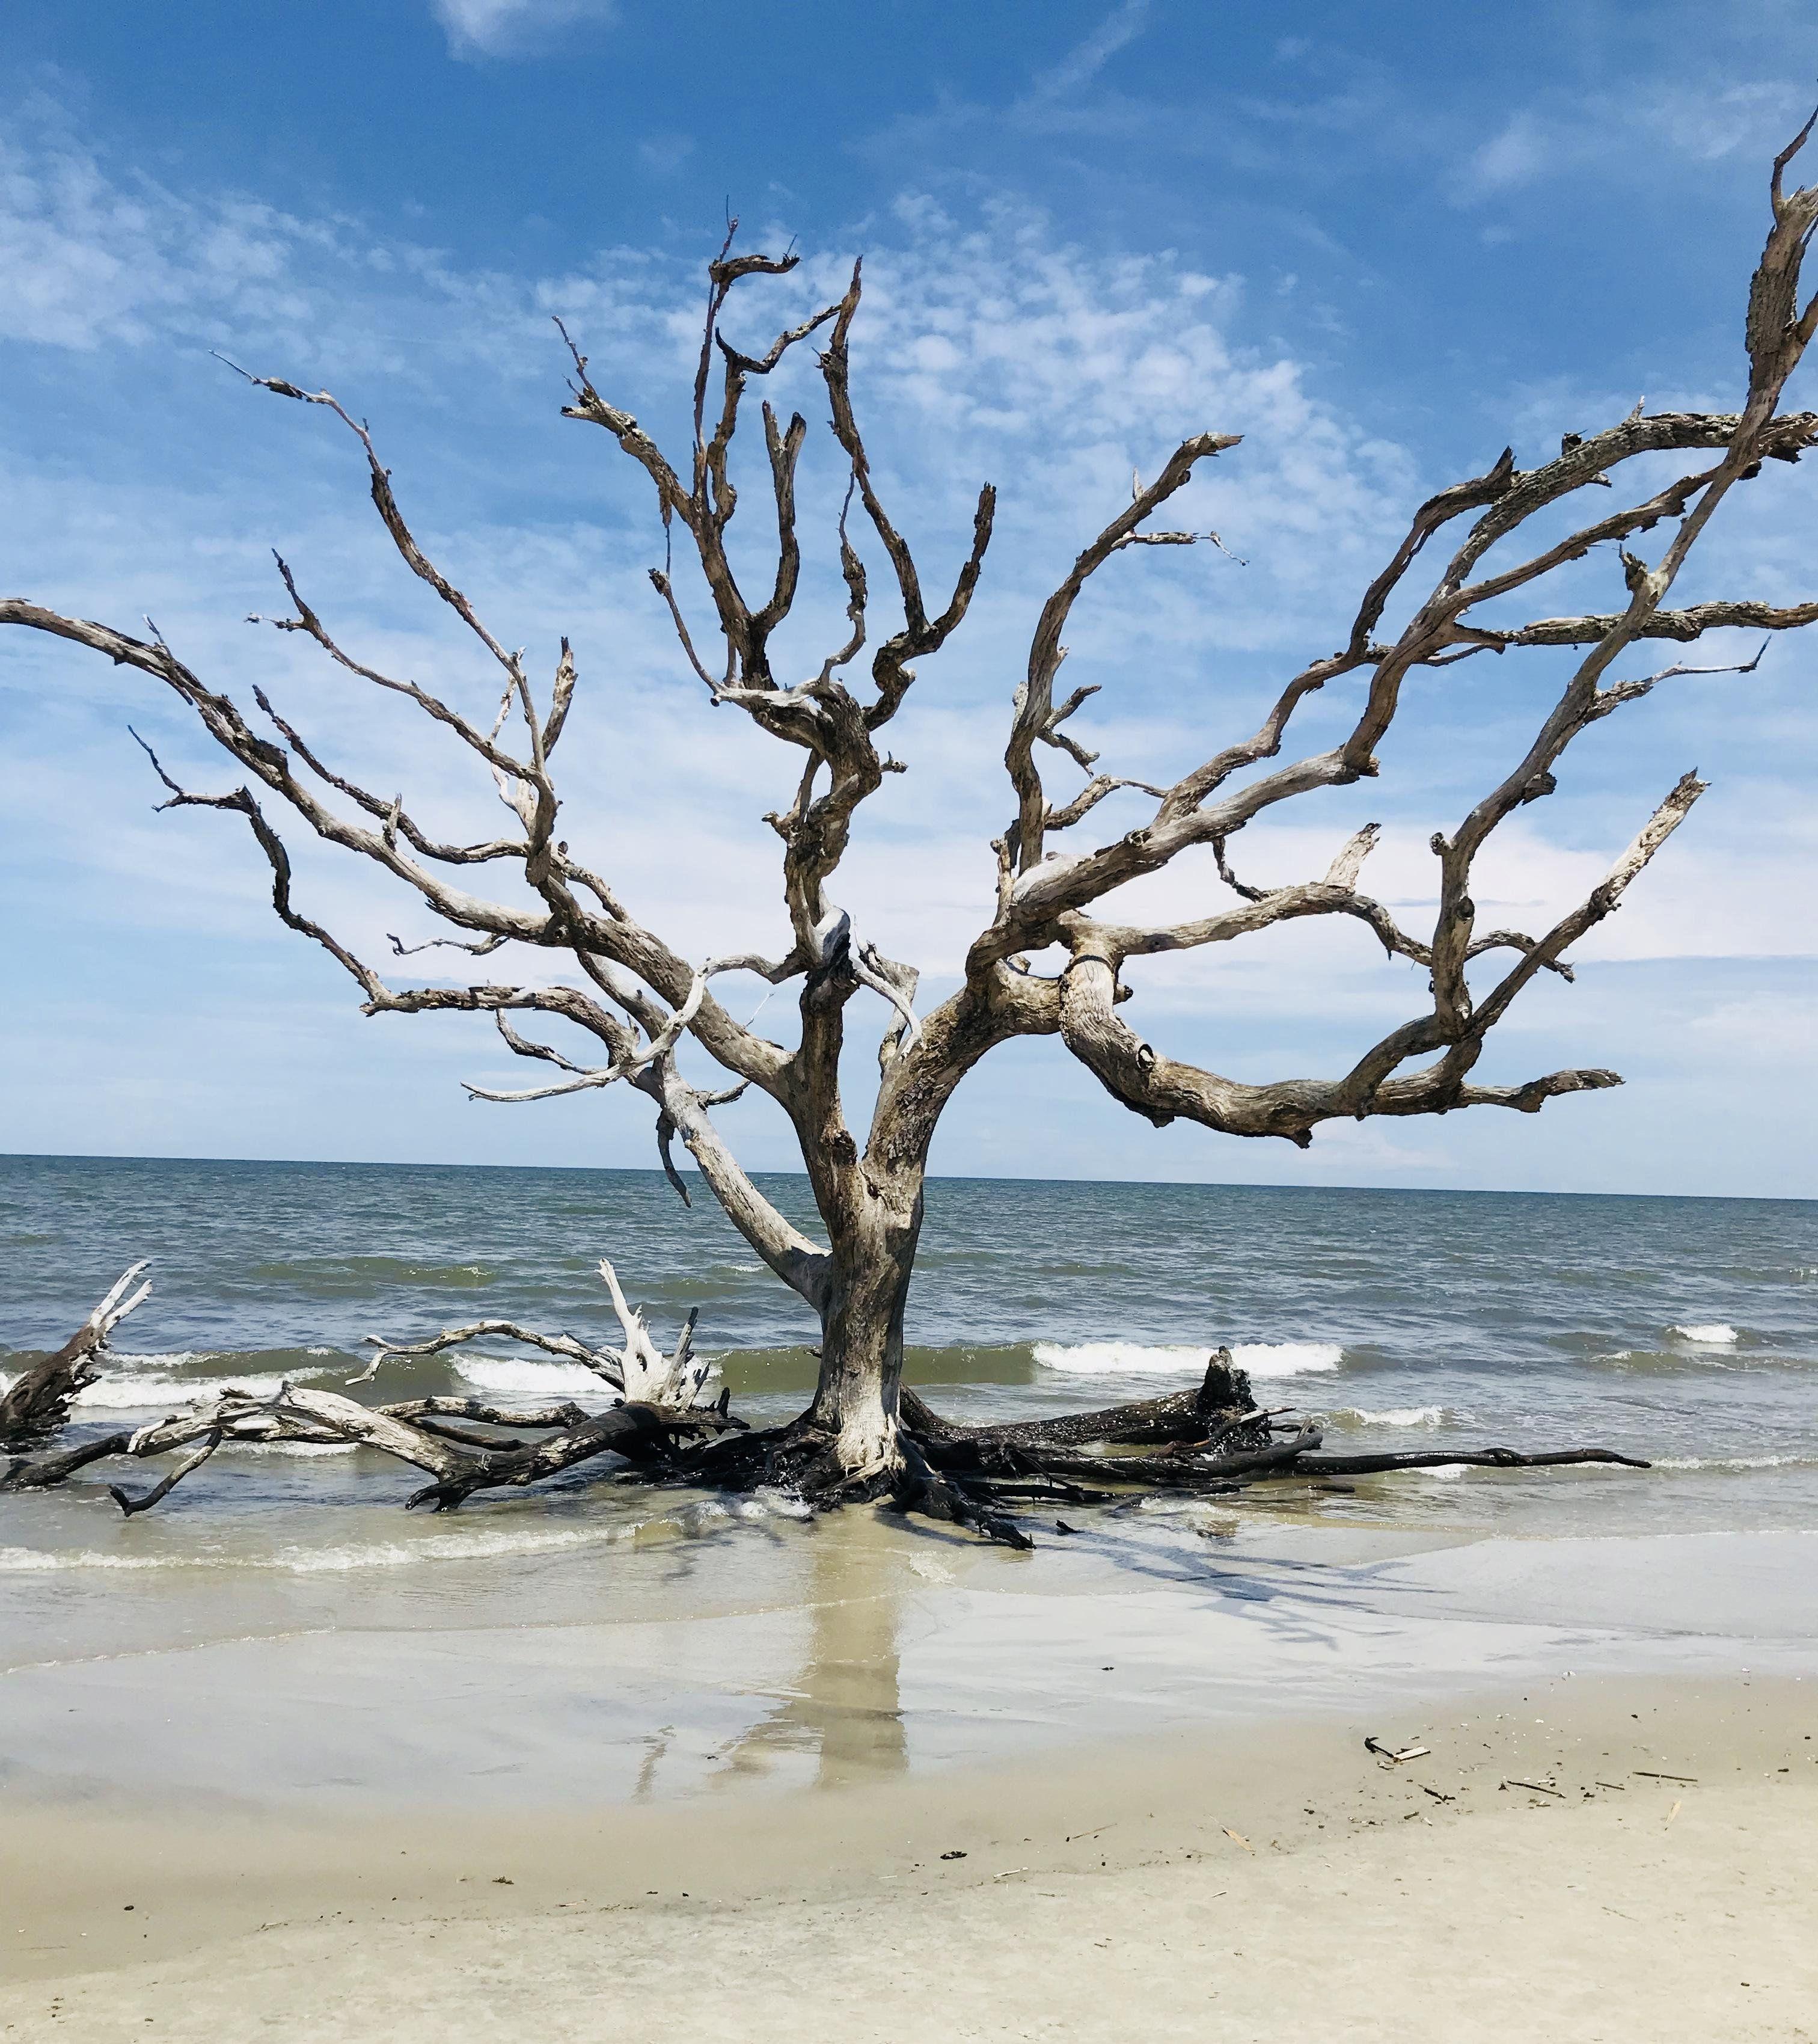 Driftwood beach jekyll island oc 3024x3399